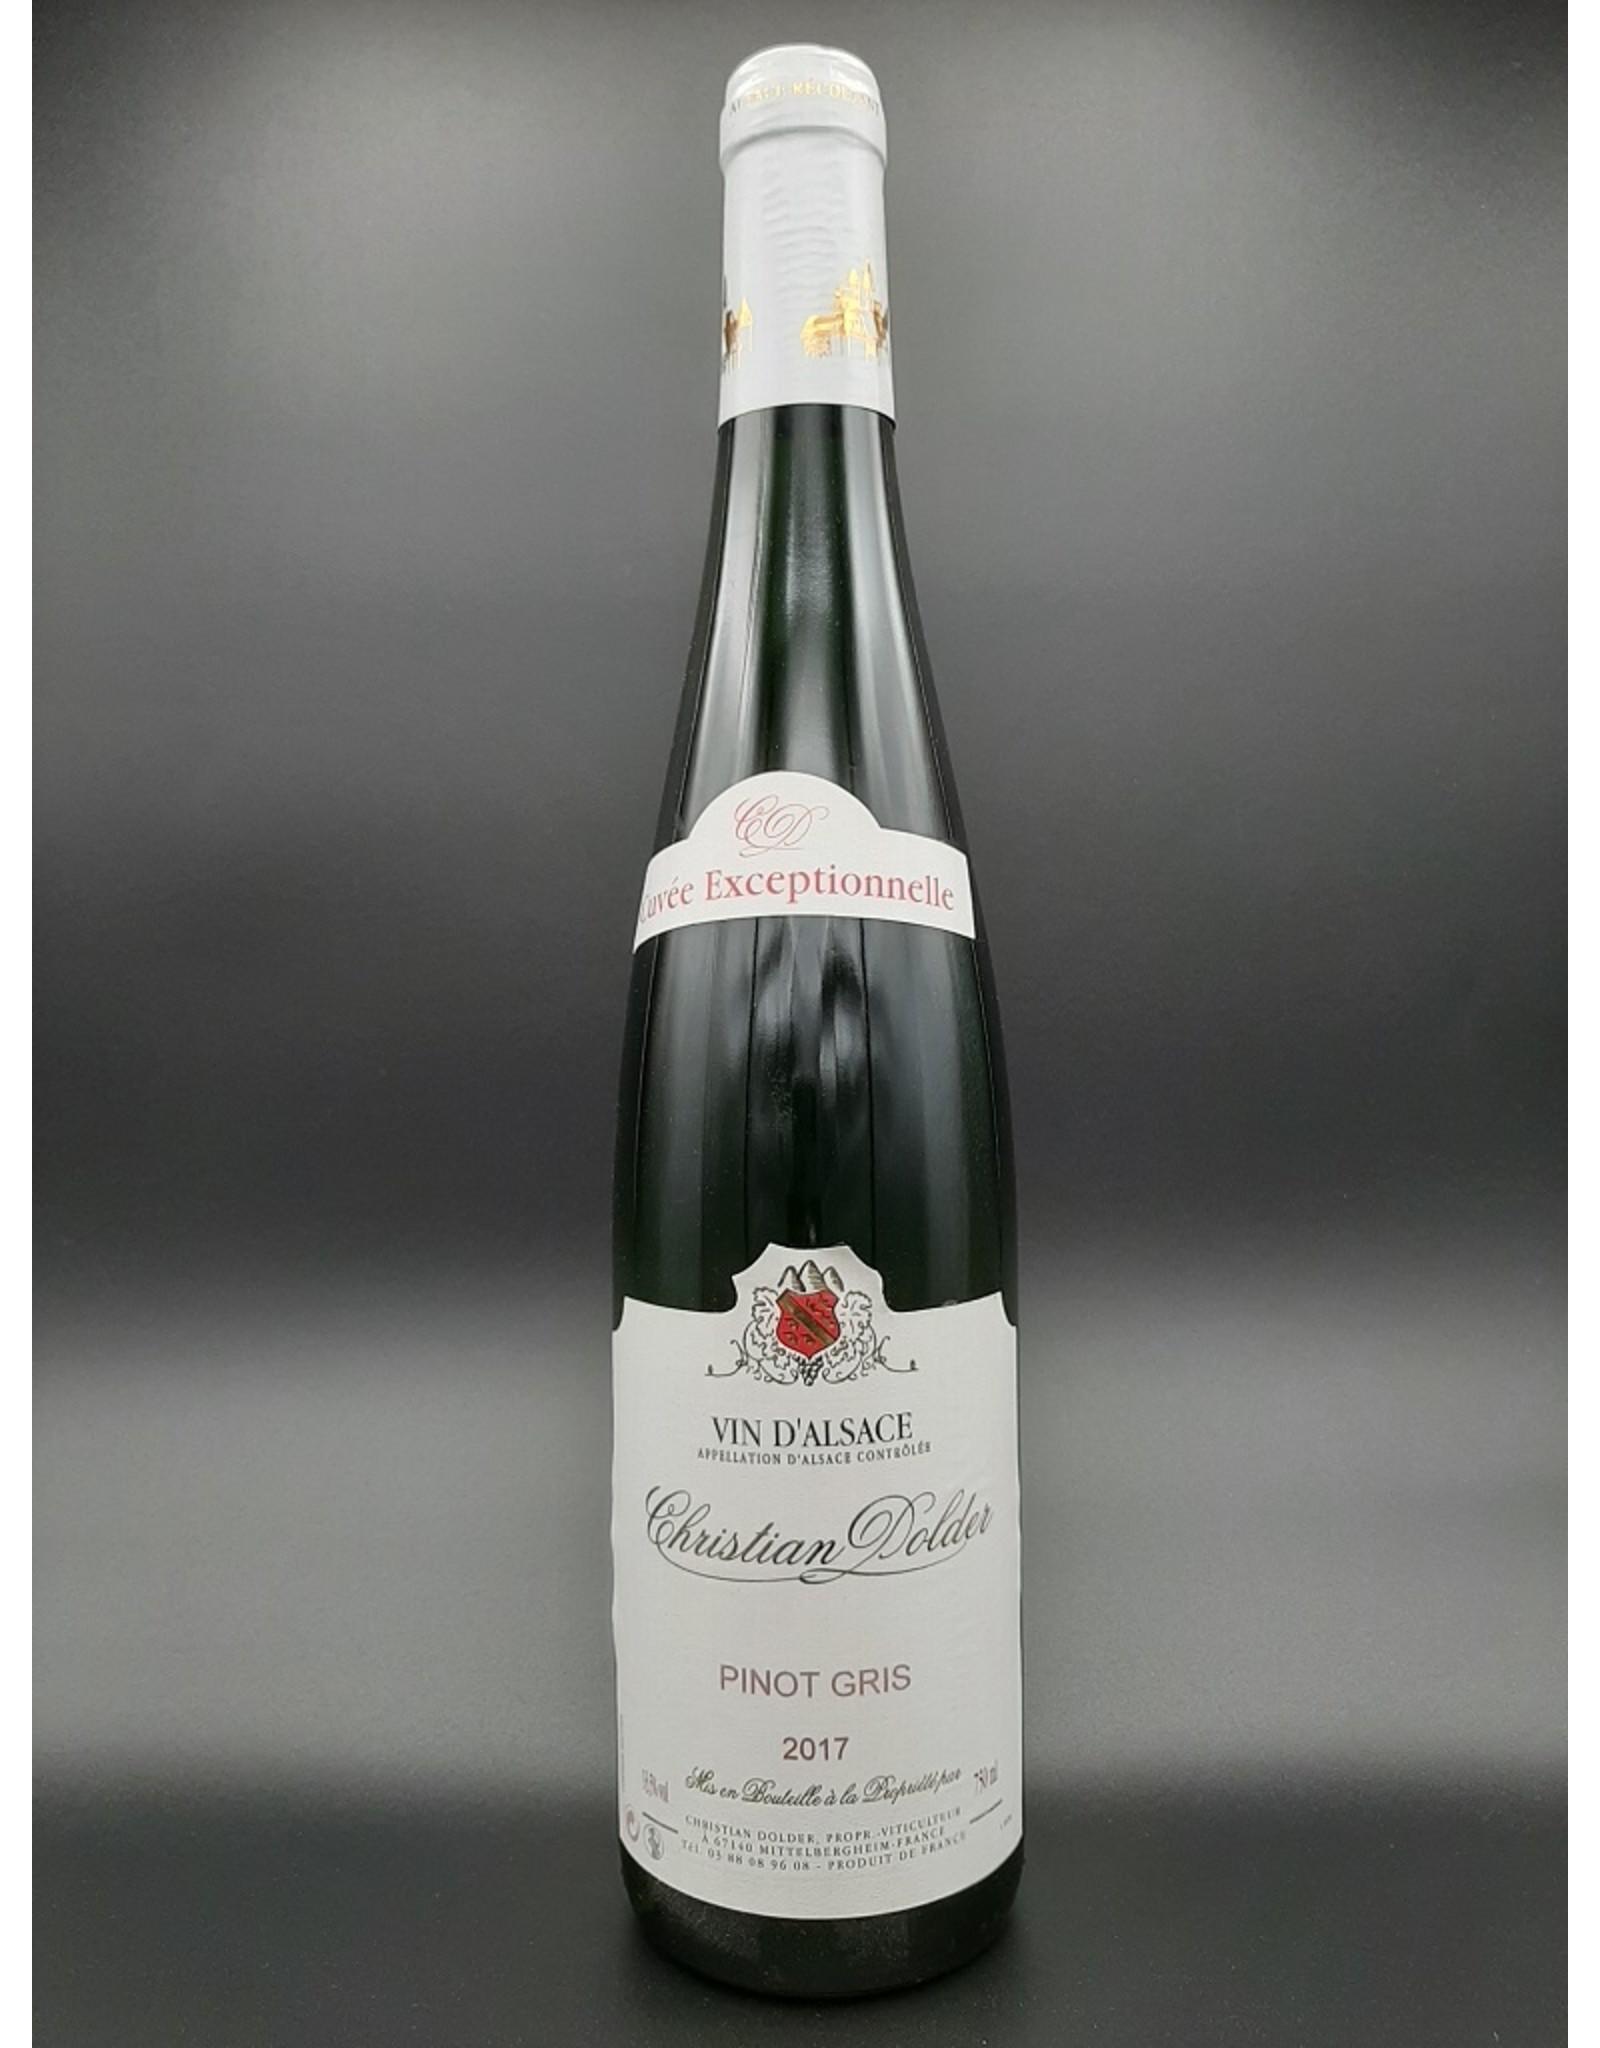 Domaine Christian Dolder Pinot gris 2017